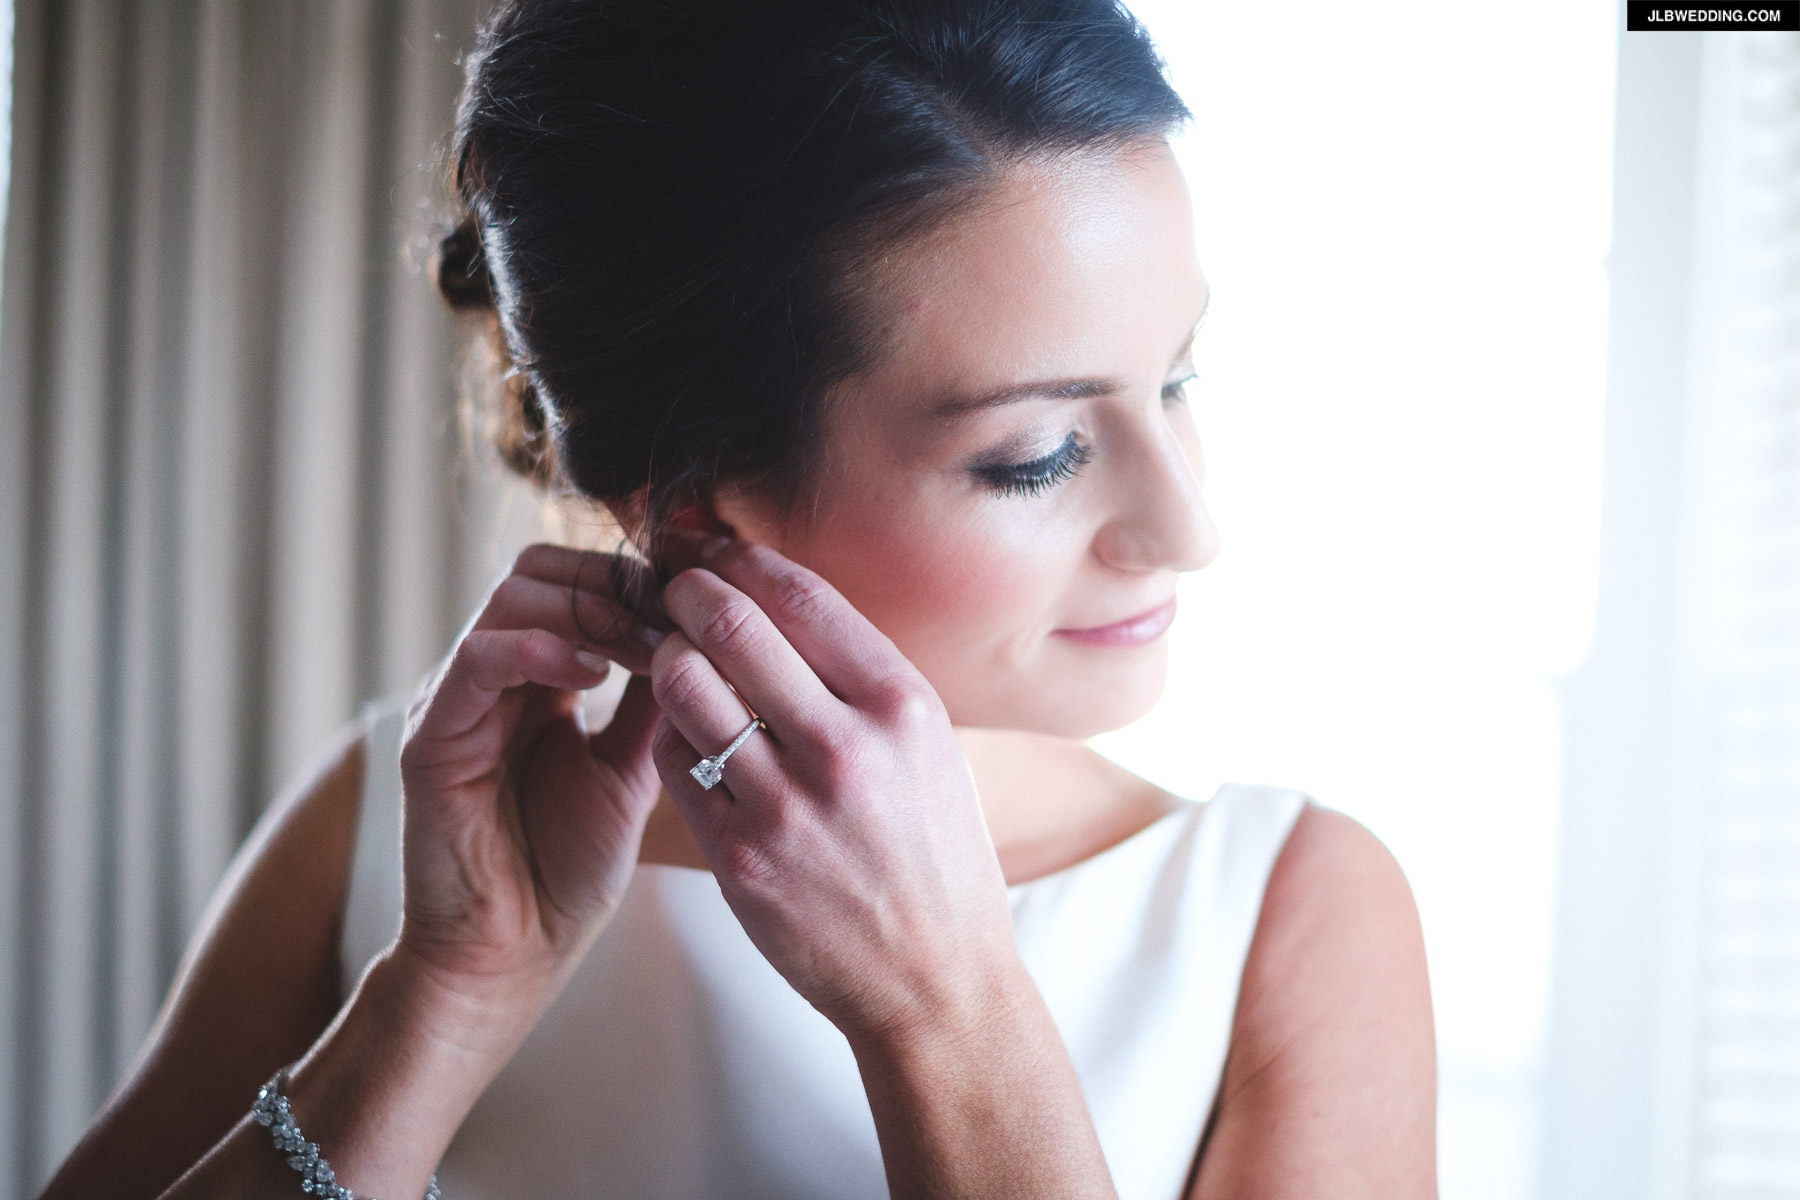 Sarah putting on earring